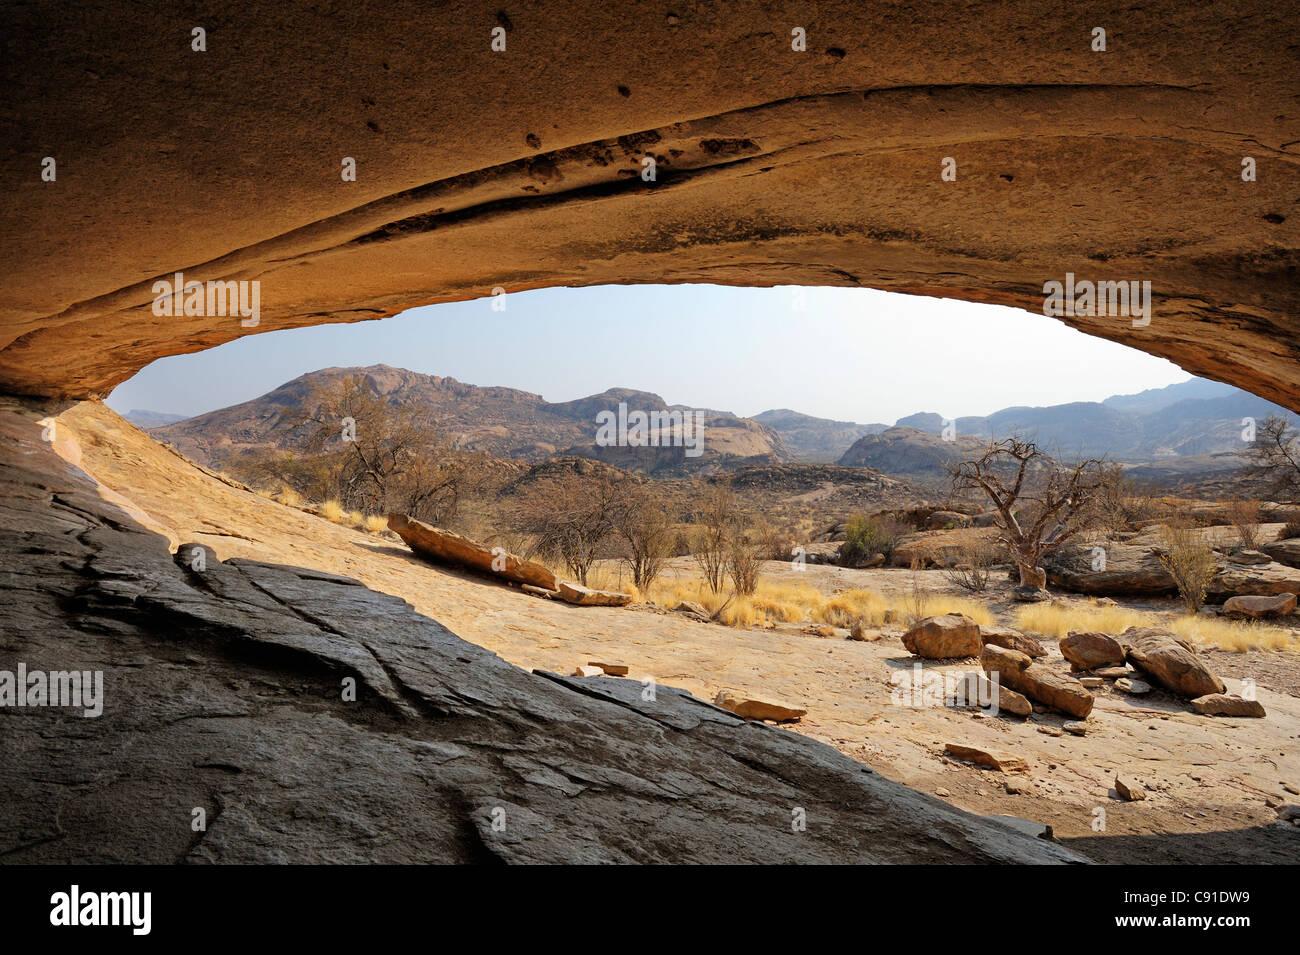 Rock Shelter Phillipp´s Höhle mit Aussicht über Savannah, Ameib, Erongo Berge, Namibia Stockfoto